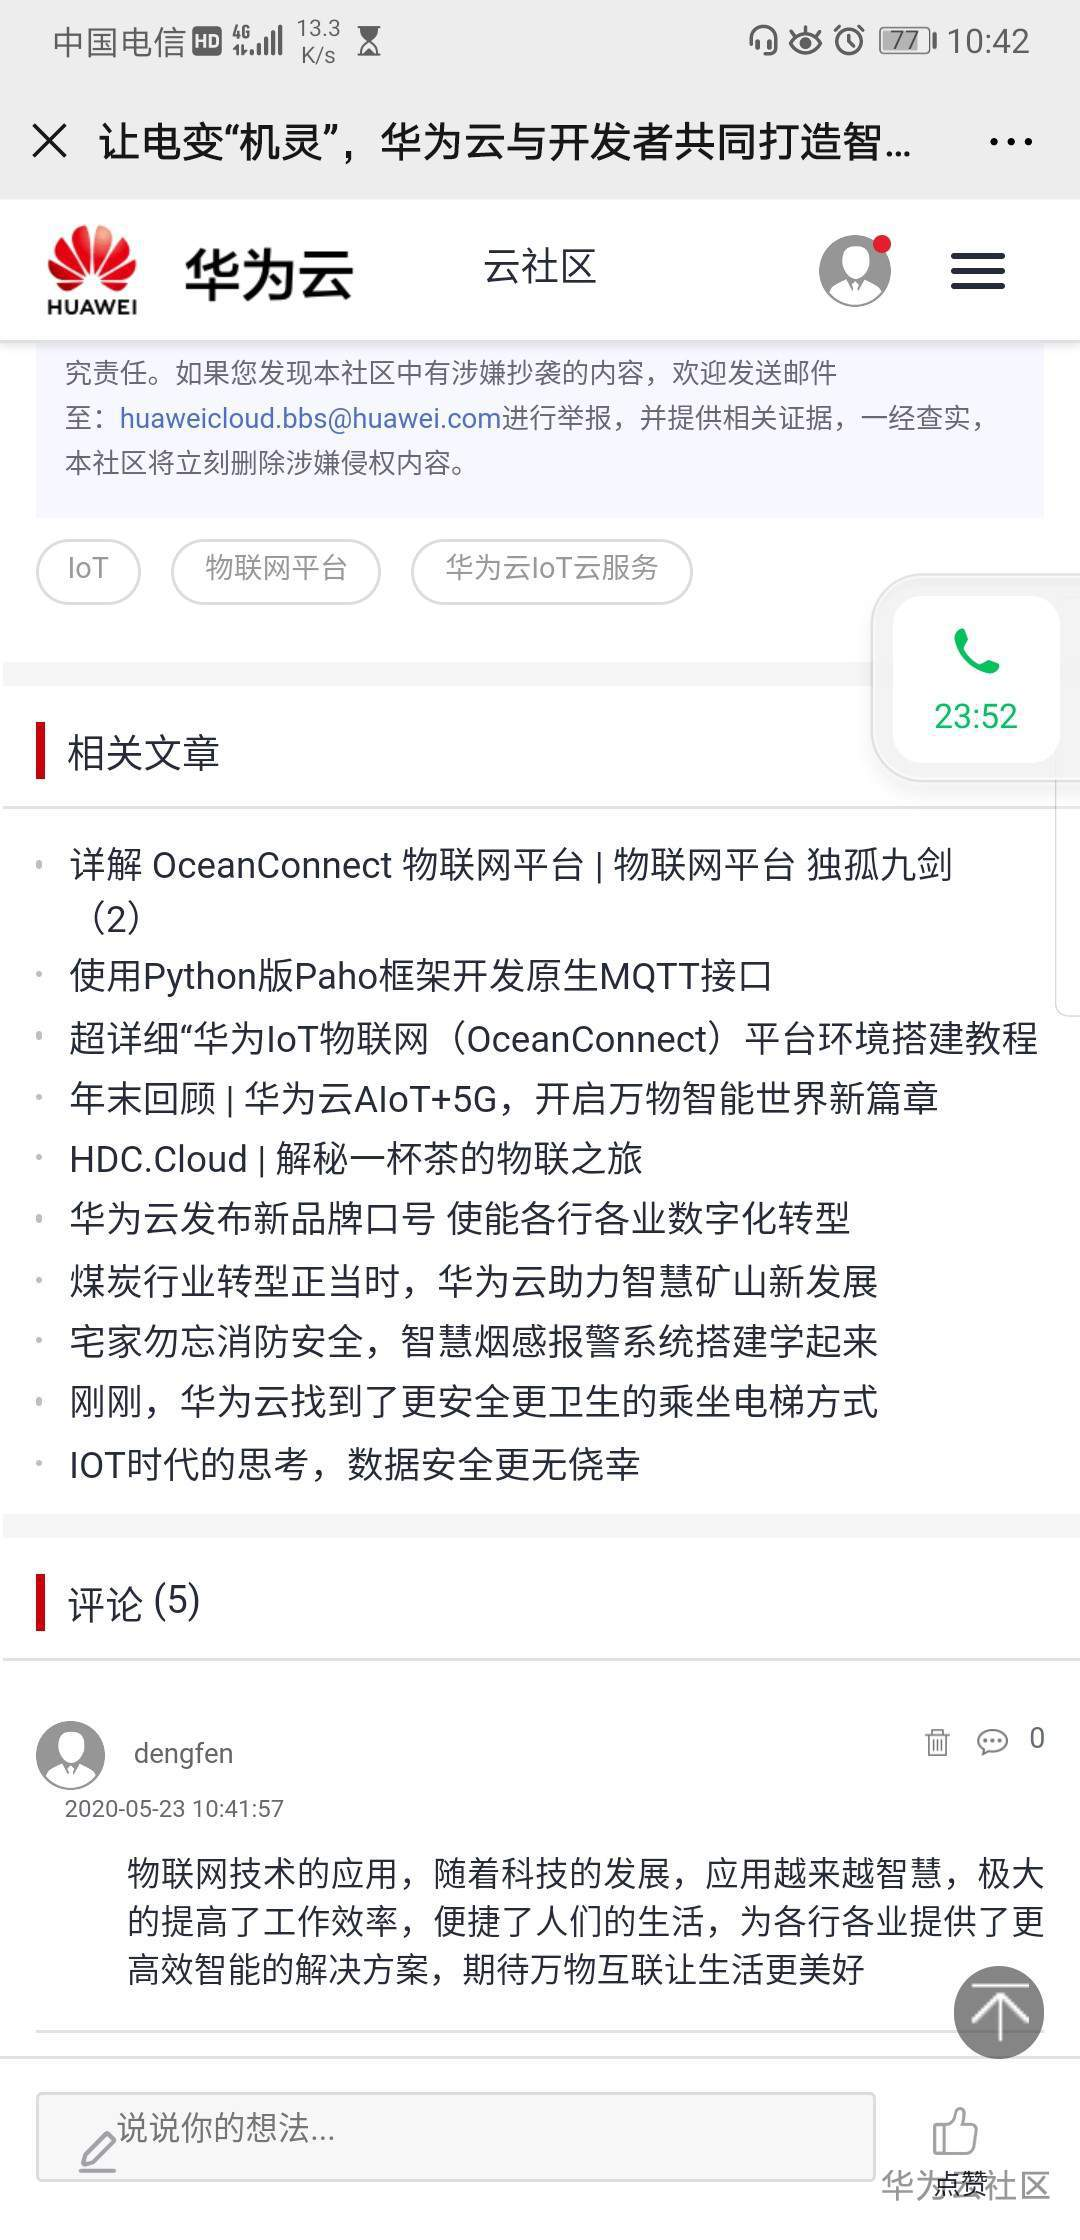 Screenshot_20200523_104214_com.tencent.mm.jpg